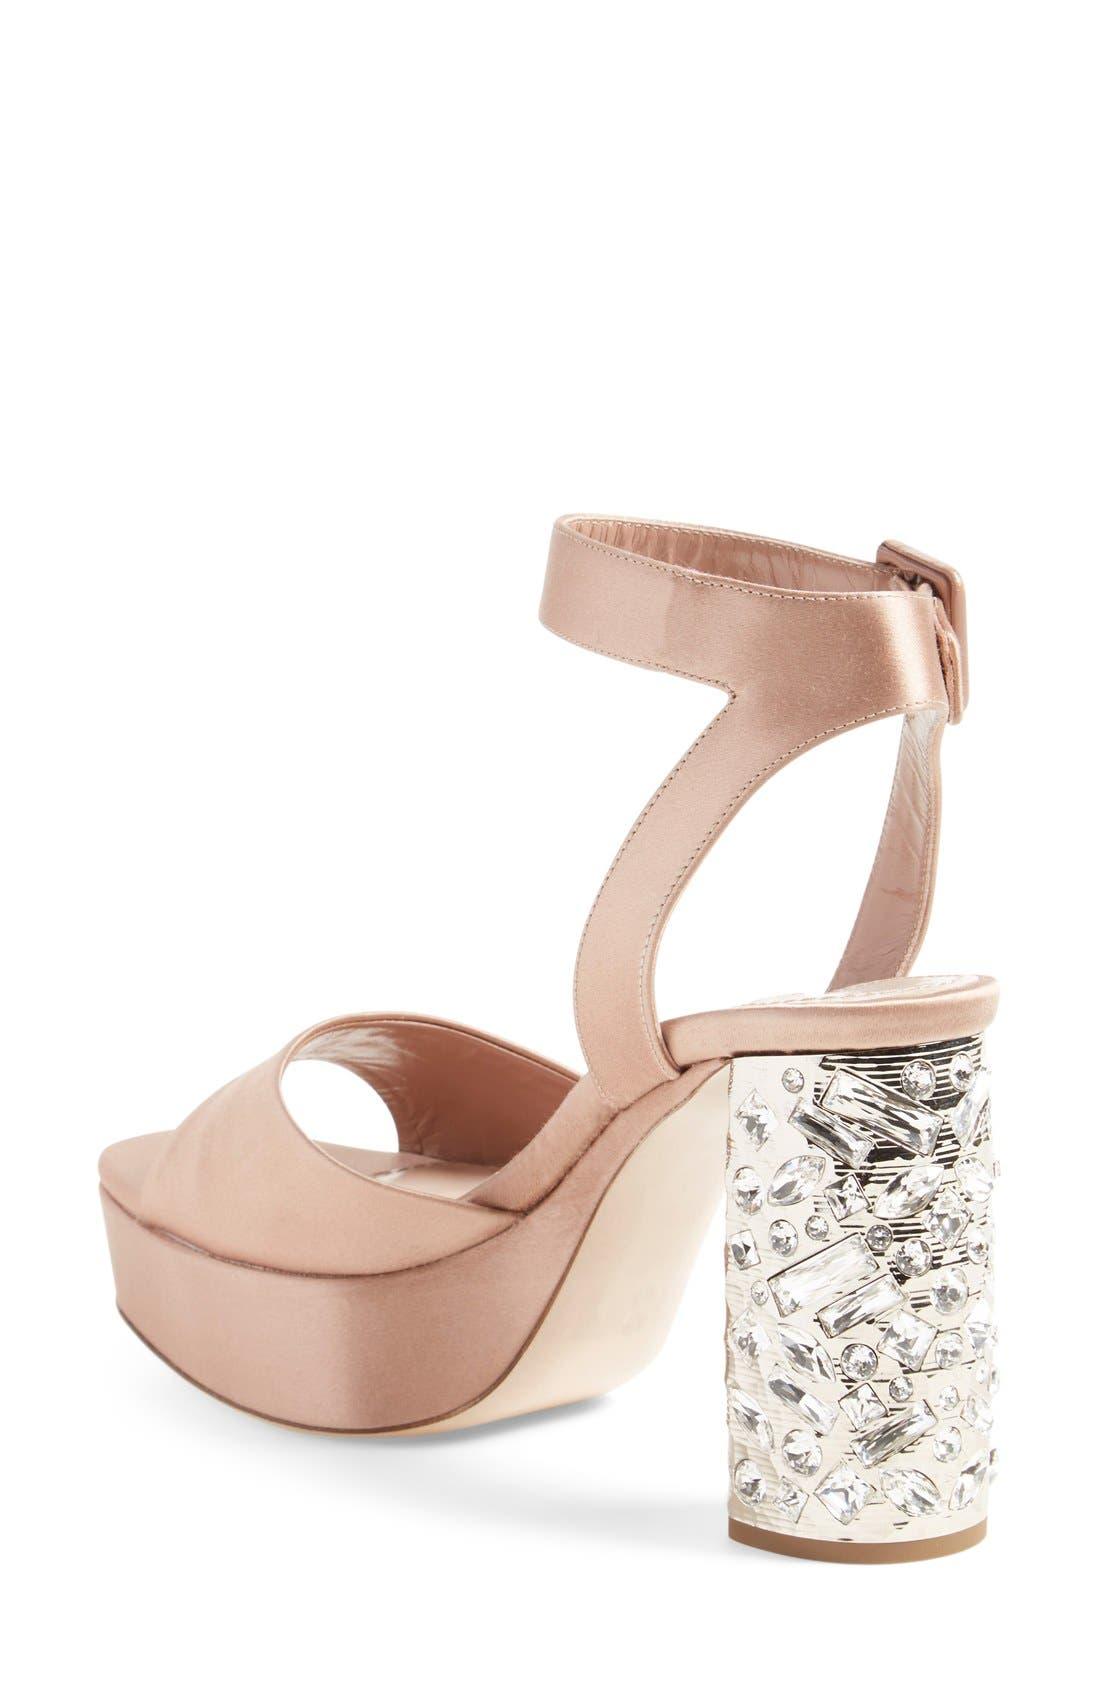 Alternate Image 2  - Miu Miu Studded Block Heel Platform Sandal (Women) (Nordstrom Exclusive)